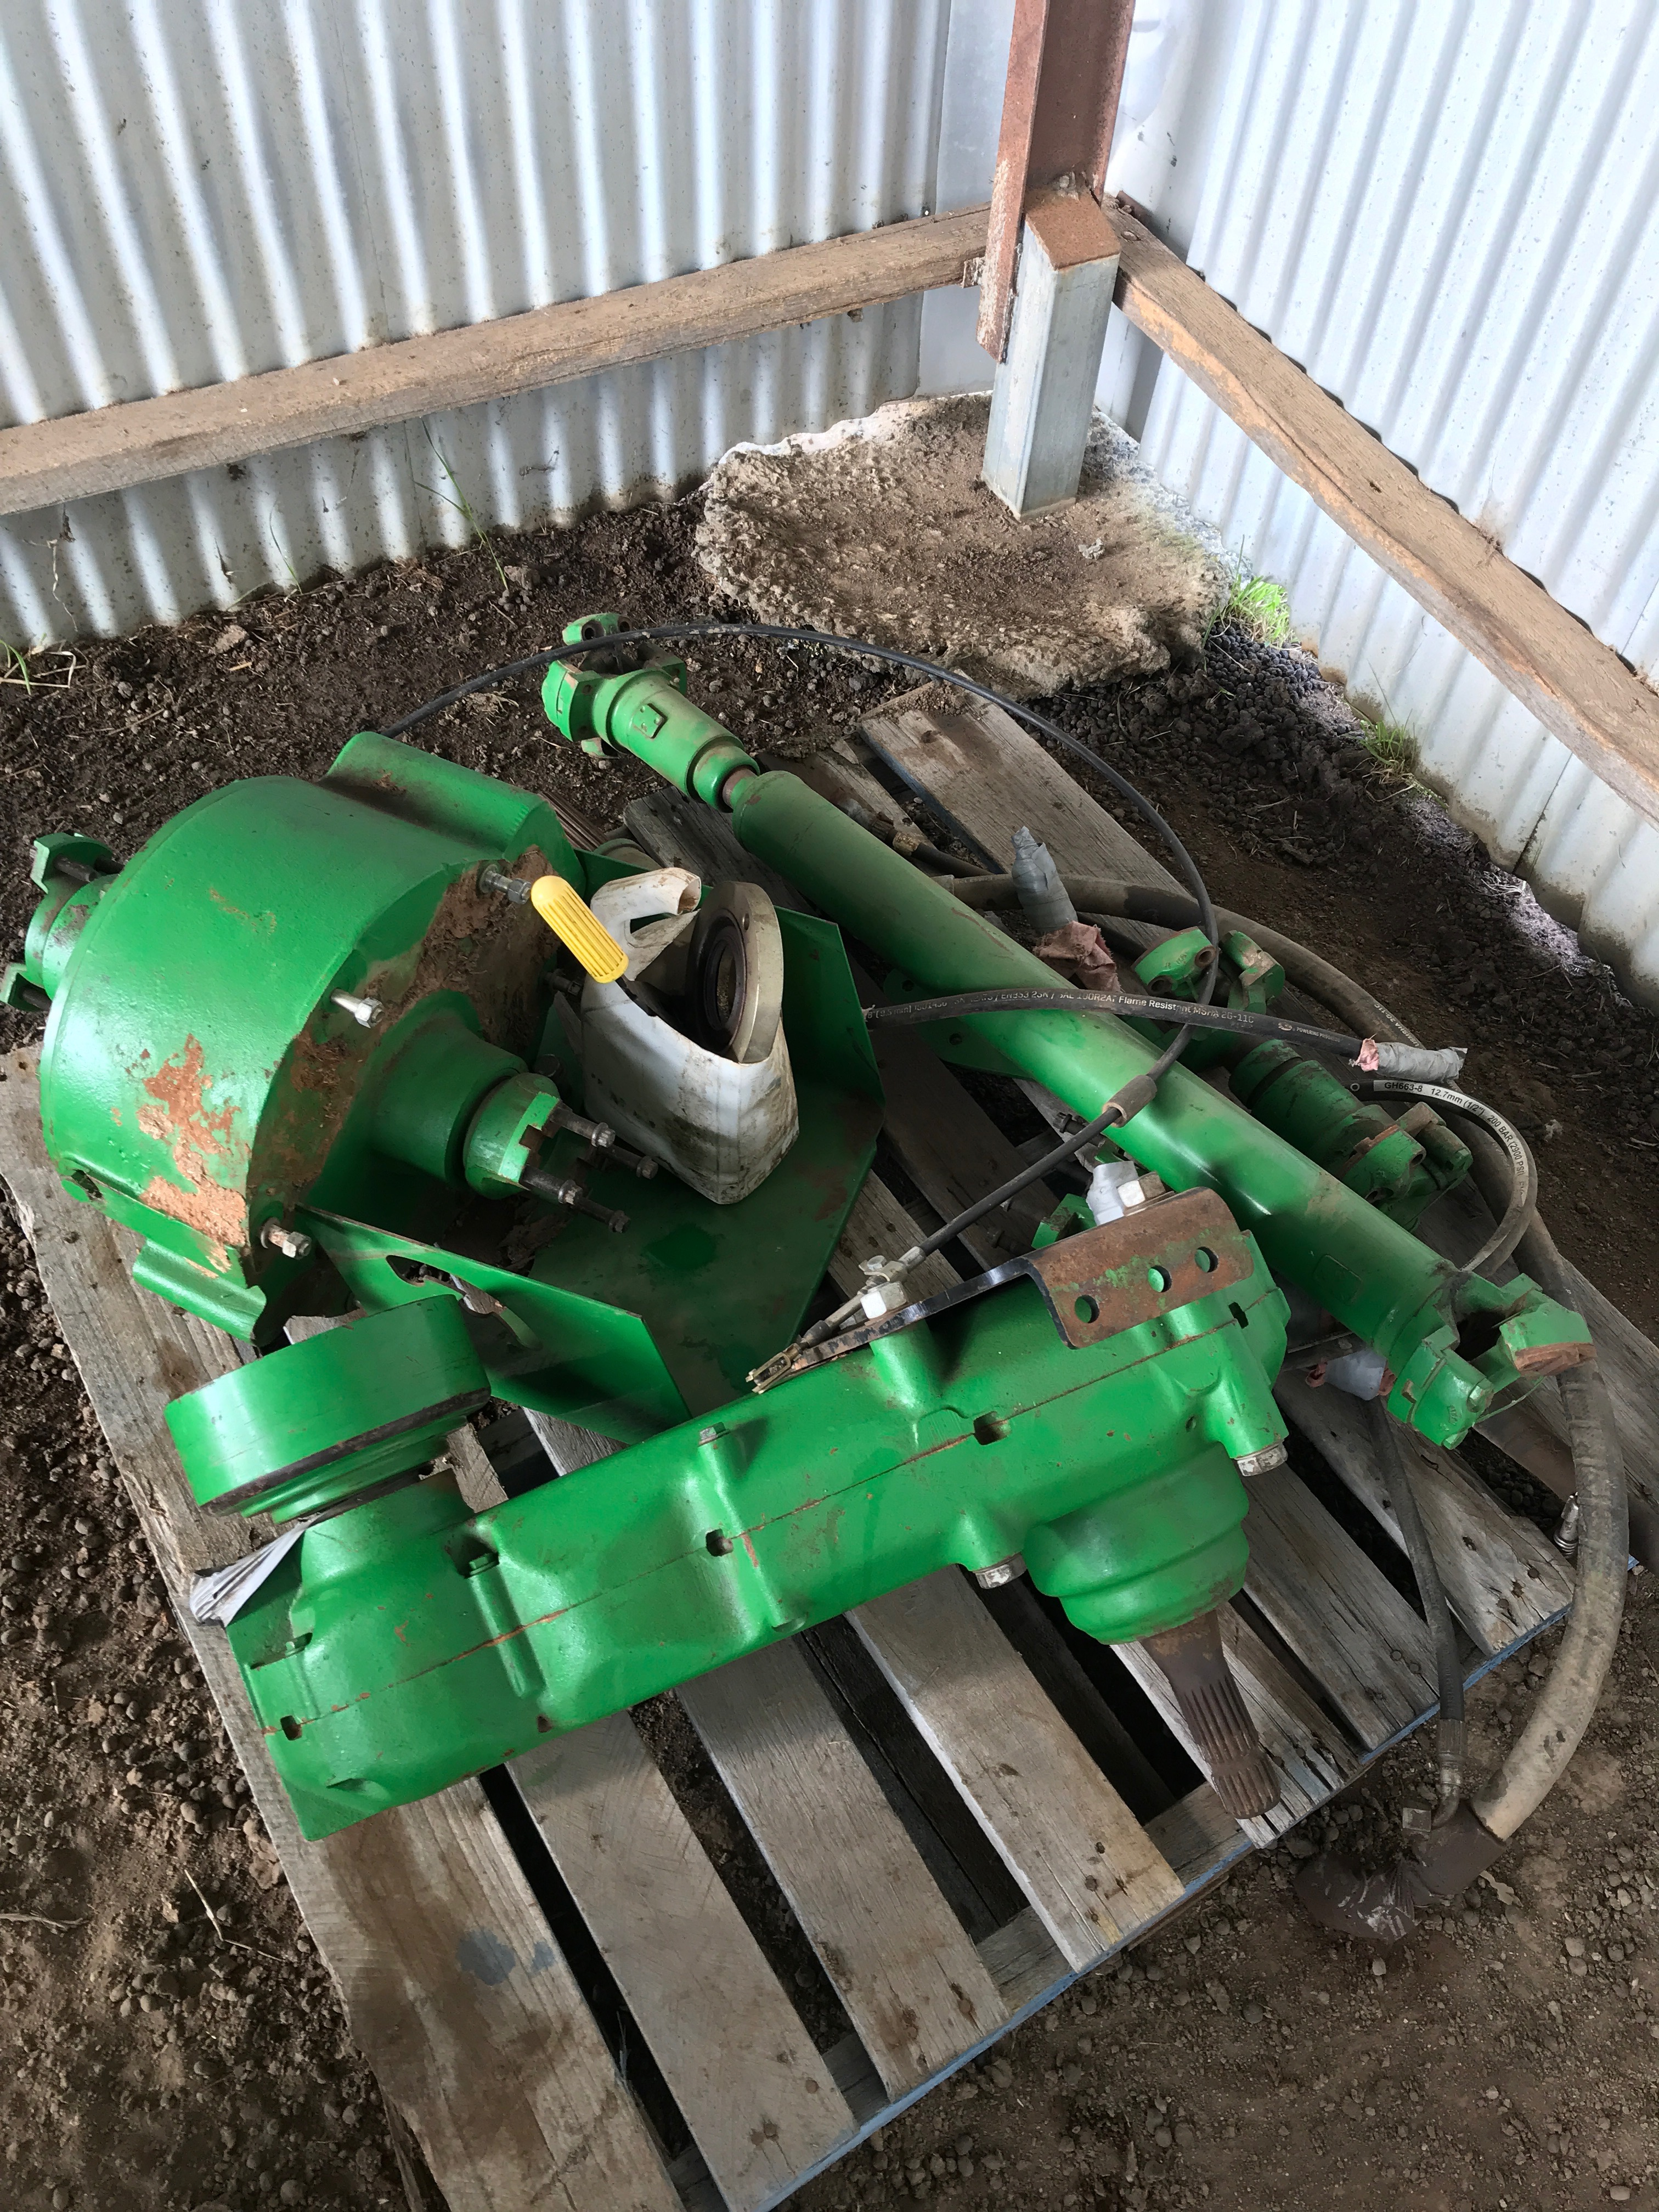 PTO kit to suit 9000 series John Deere tractor | Machinery